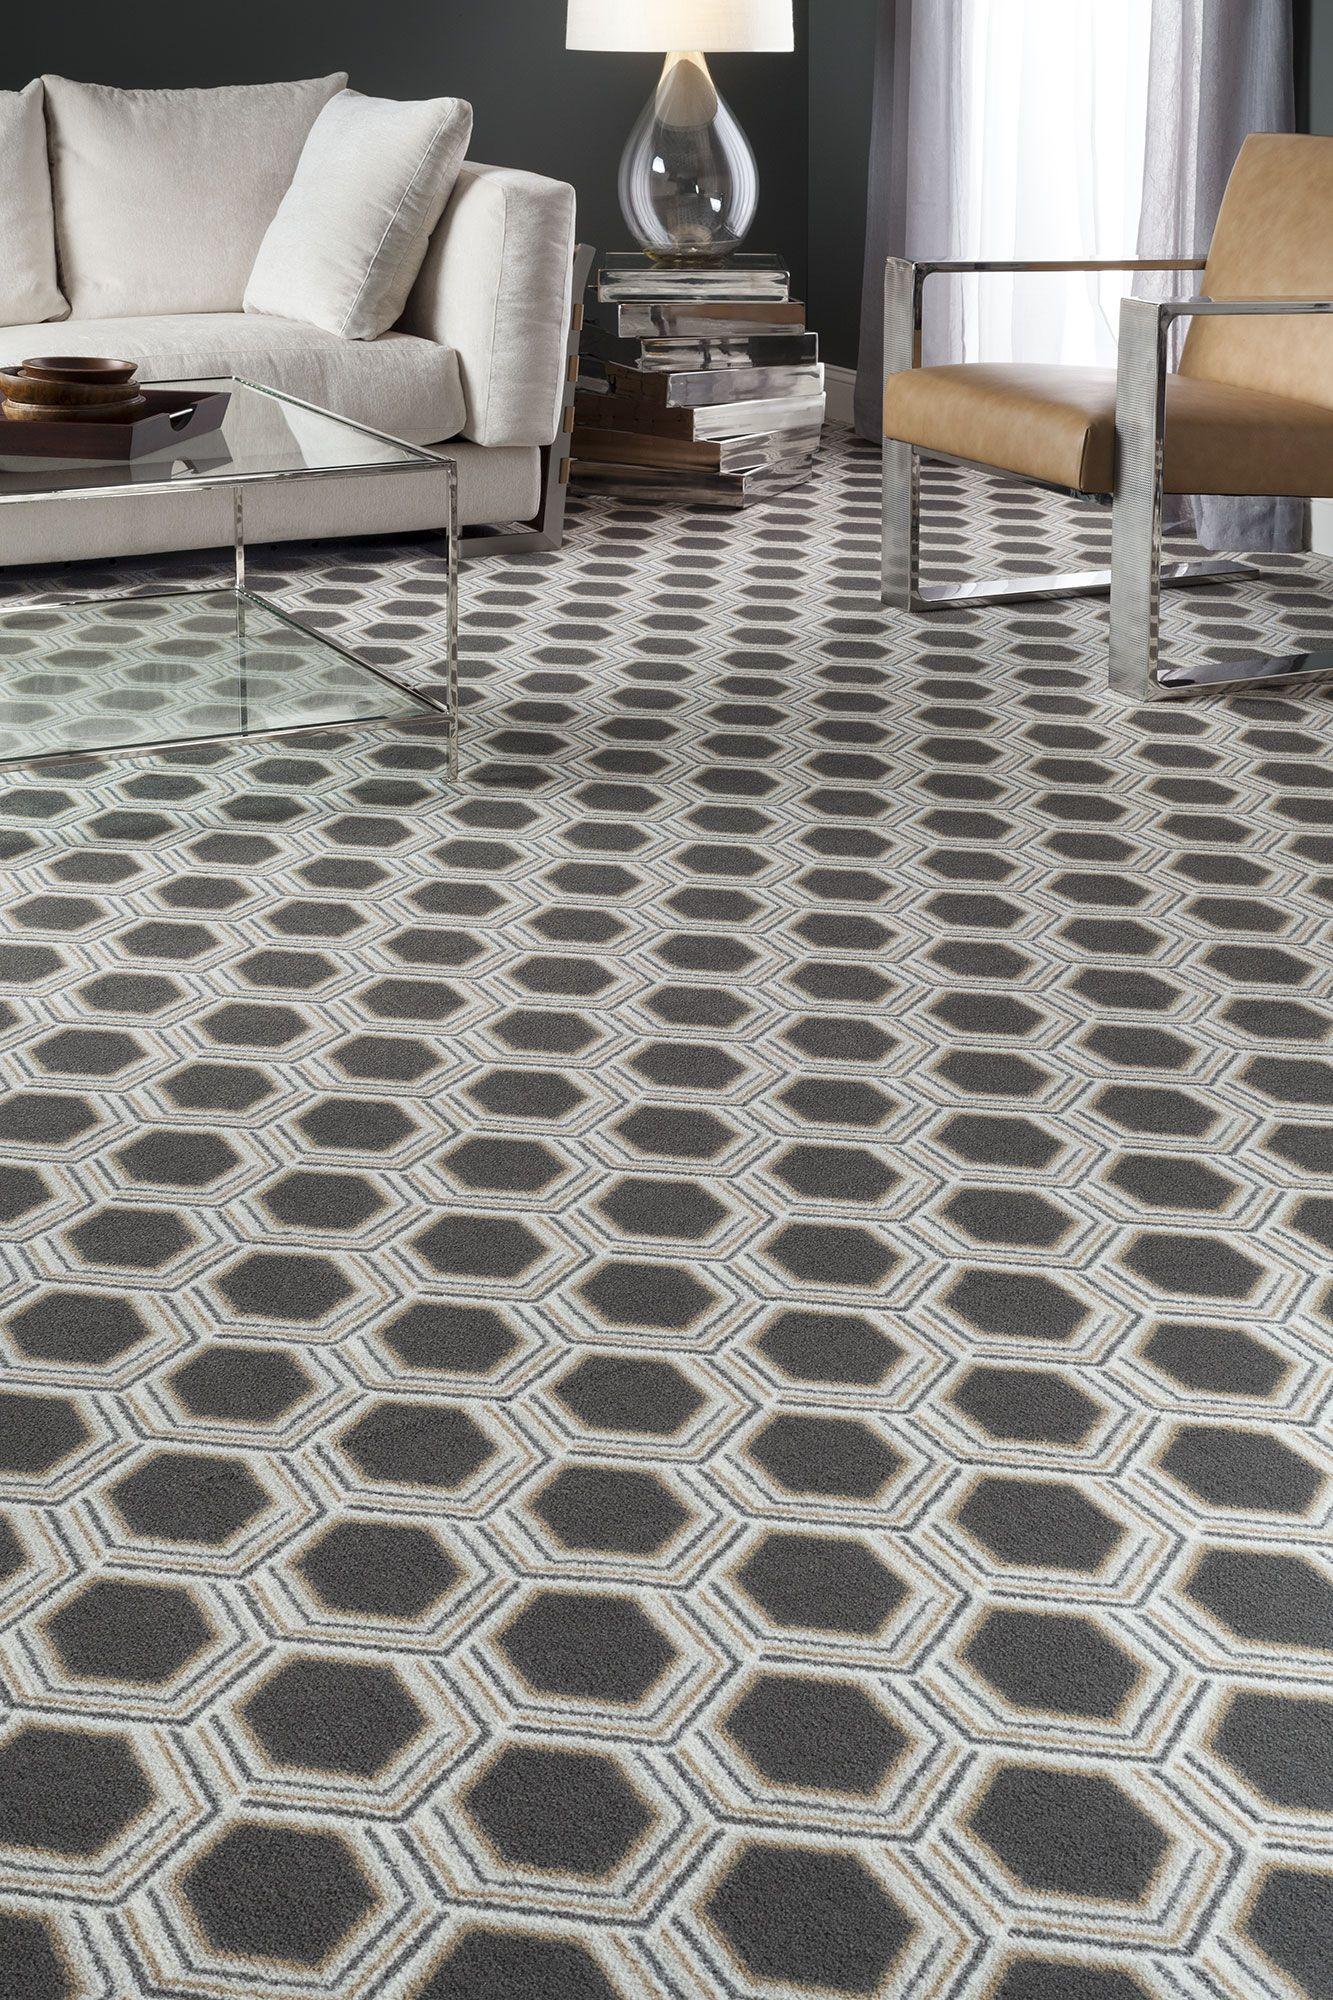 Custom Carpet Or Area Rugs From Miliken Modern Flair Broadloom